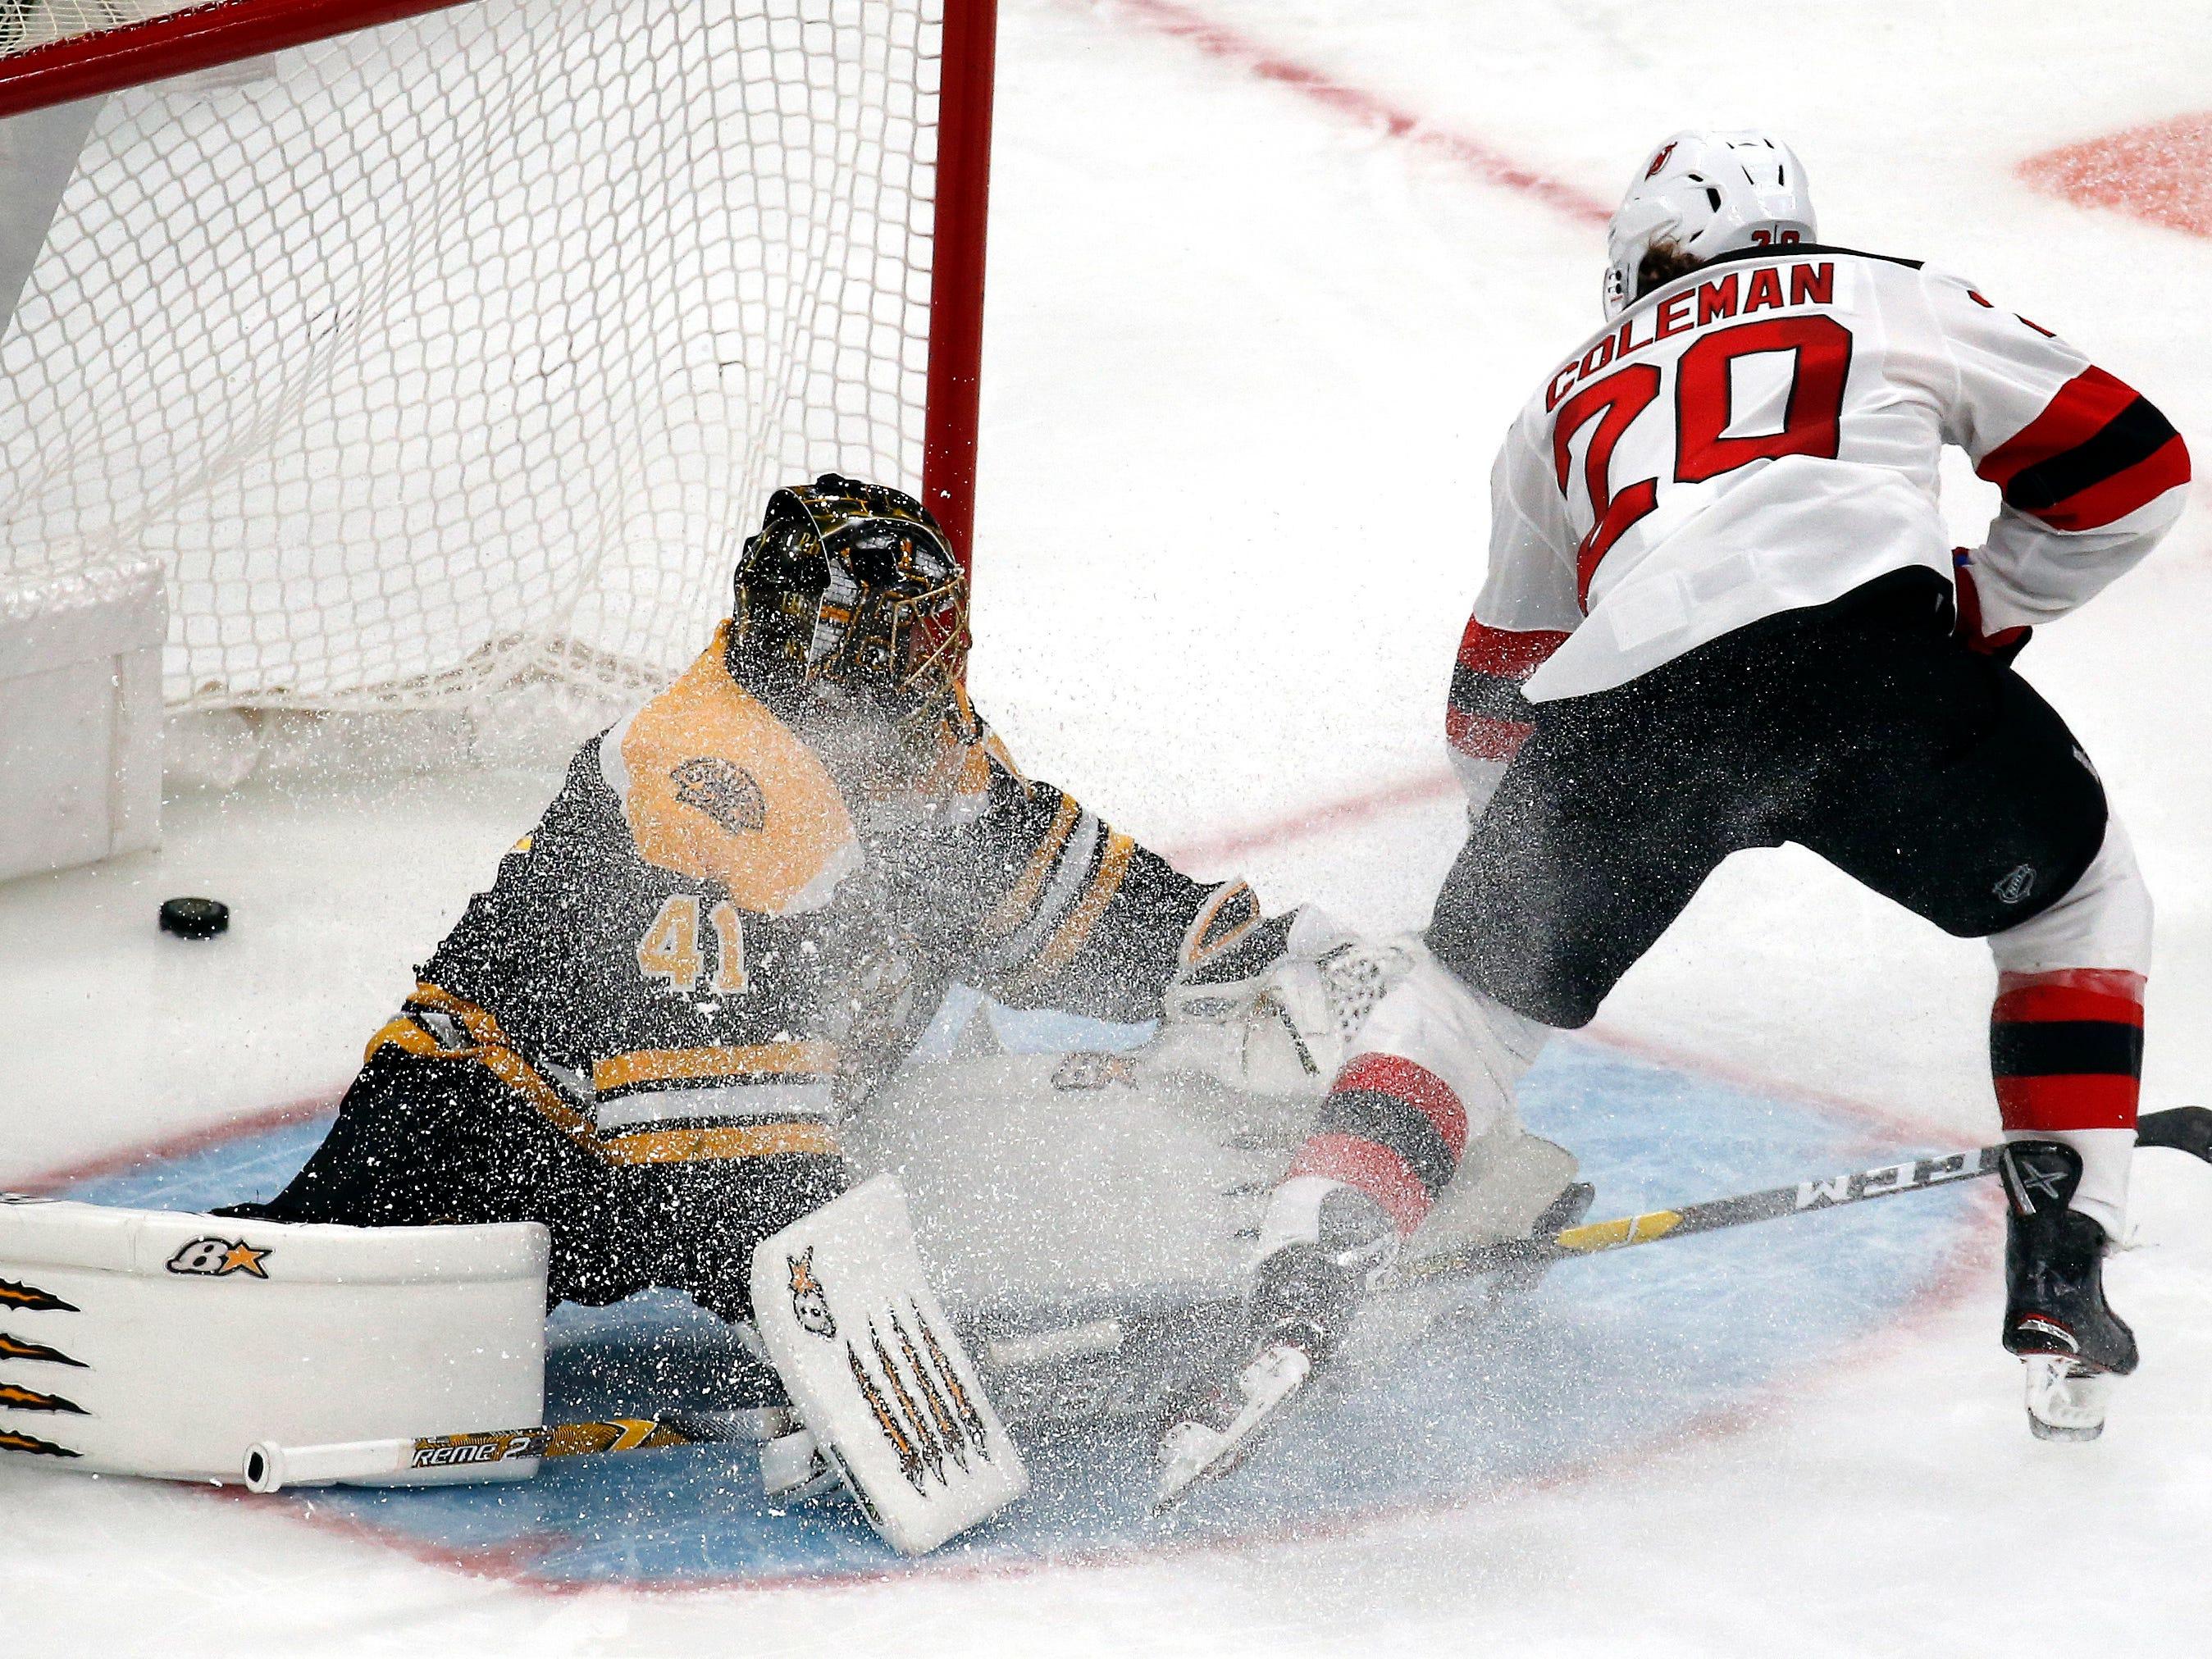 New Jersey Devils center Blake Coleman (20) scores a breakaway goal against Boston Bruins goaltender Jaroslav Halak (41) during the third period of an NHL hockey game Thursday, Dec. 27, 2018, in Boston.